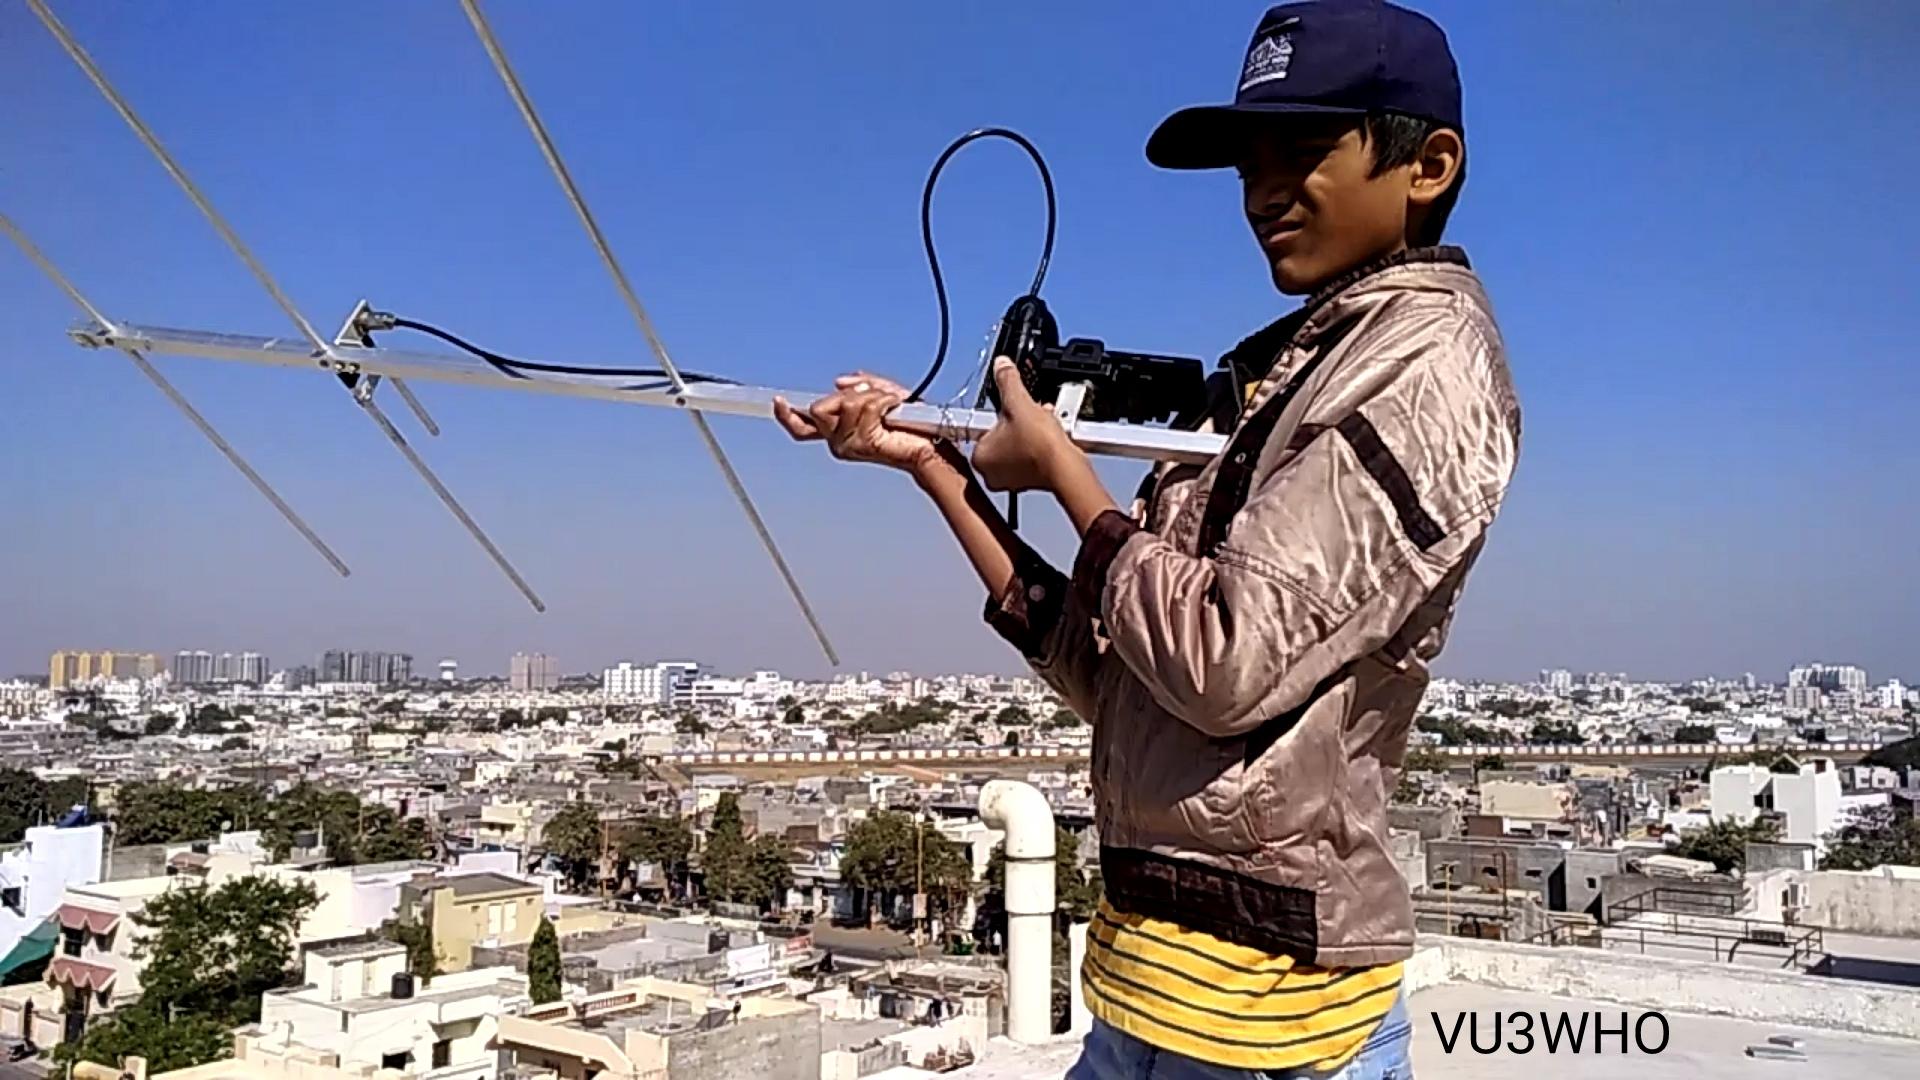 VU3WHO Snehal Vagadia Receiving SSTV Image.jpg